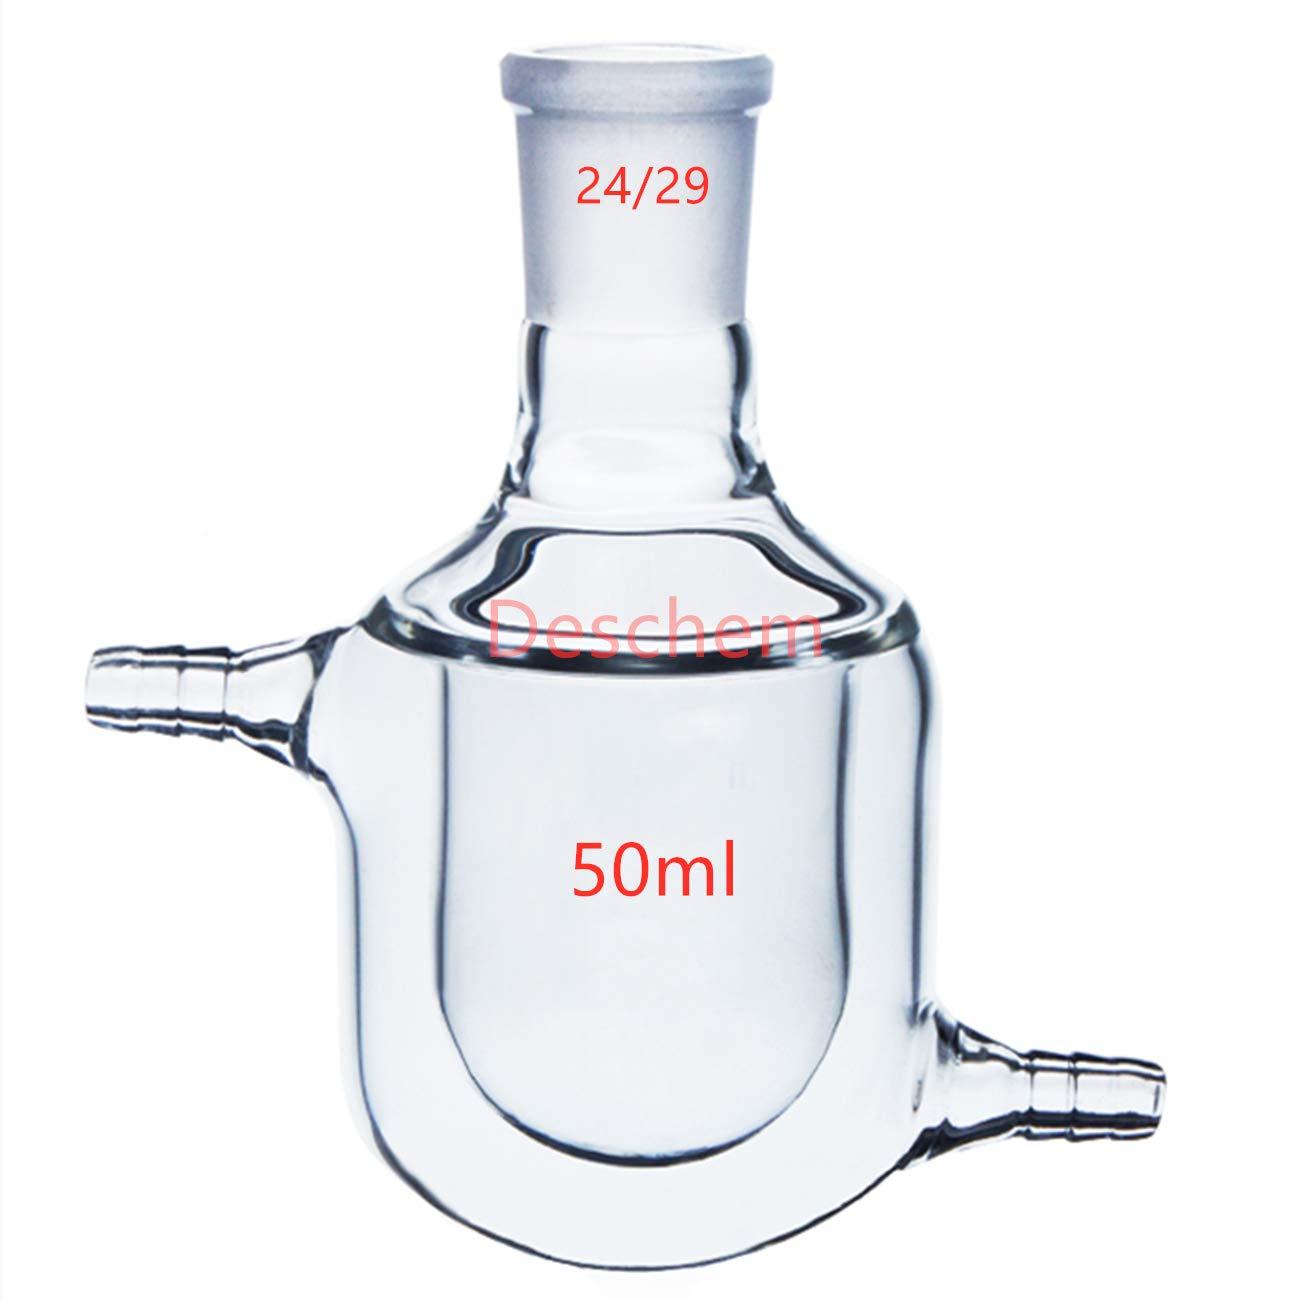 Deschem 50ml,24/29,Single Neck,Jacketed Glass Flask,One Neck Reaction Bottle,Lab Reactor Vessel by Deschem